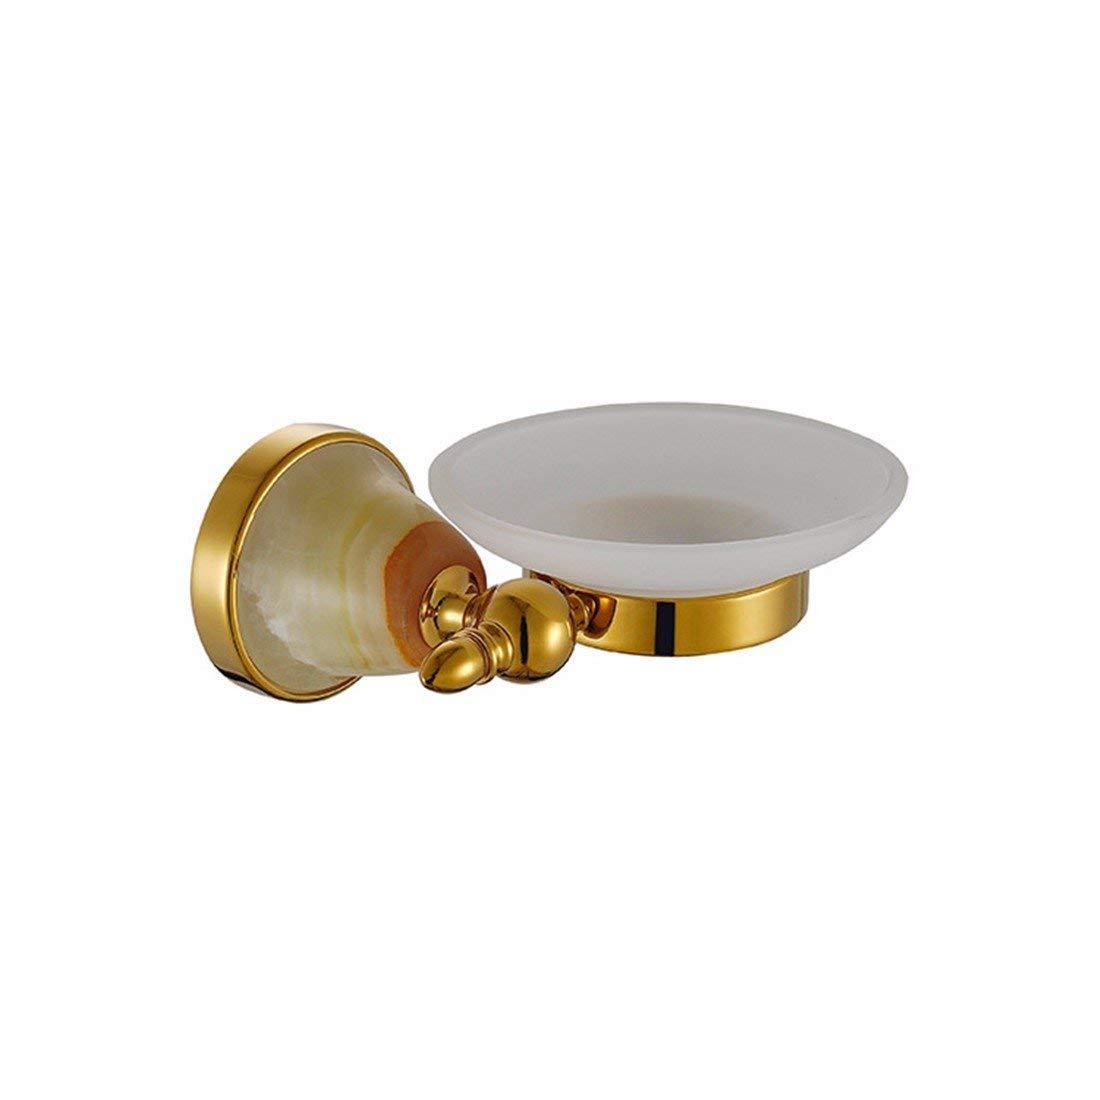 LAONA European copper base titanium gold jade bathroom accessories set soap box toilet paper holder toothbrush cup holder,Soap dish